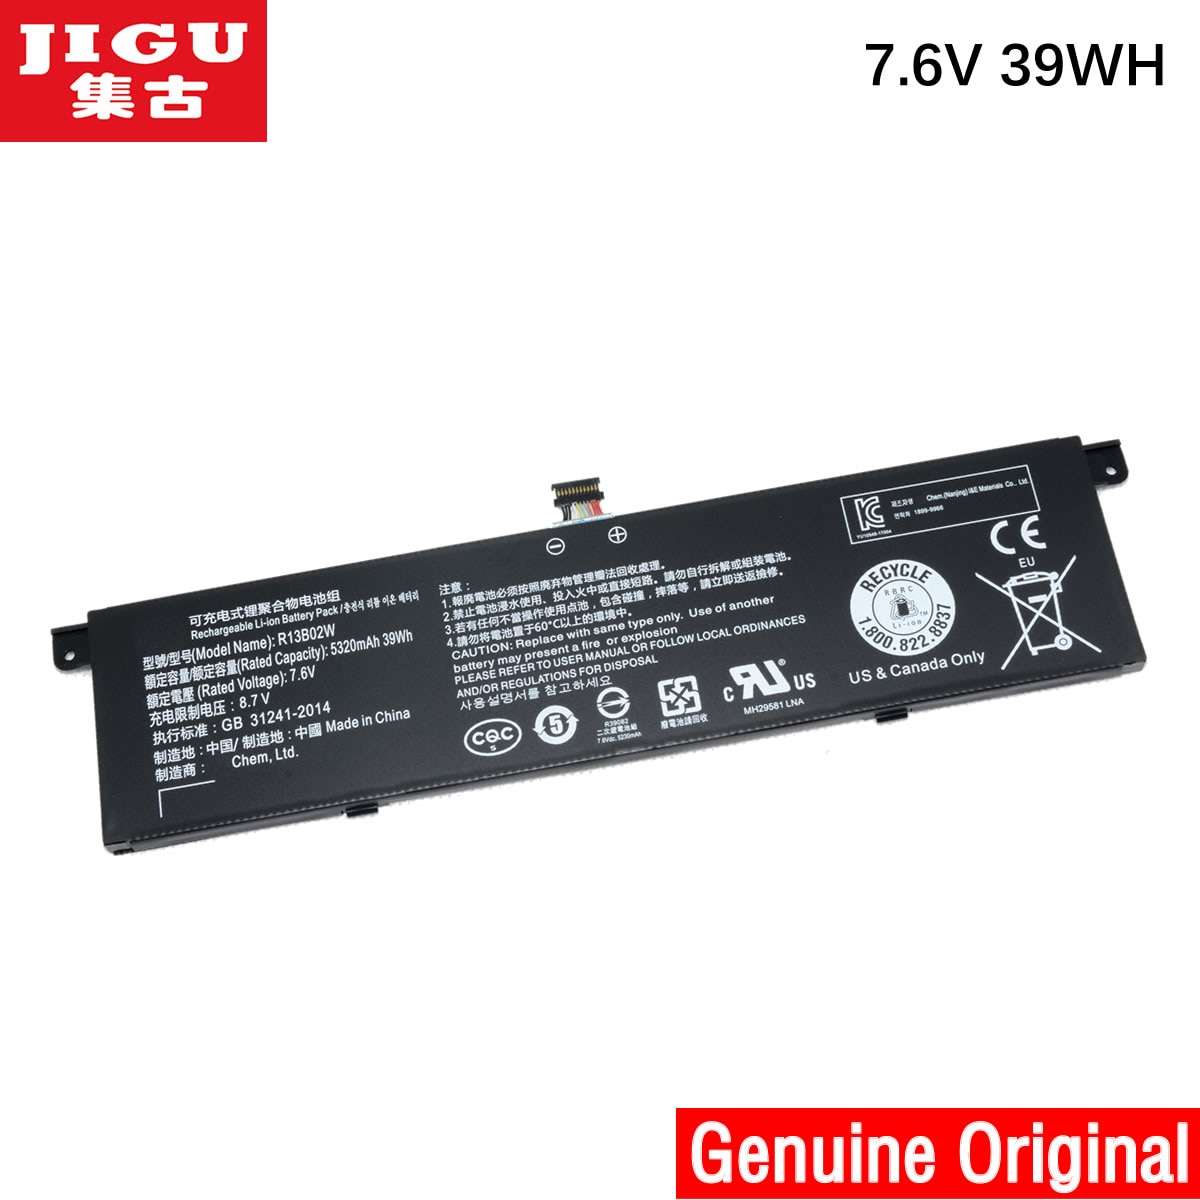 "JIGU 7,6 V 39Wh 5107 mAh/5230 mAh Original R13B02W R13B01W batería del ordenador portátil para Xiaomi mi Air 13,3 ""Serie Tablet R13B02W R13B01W"